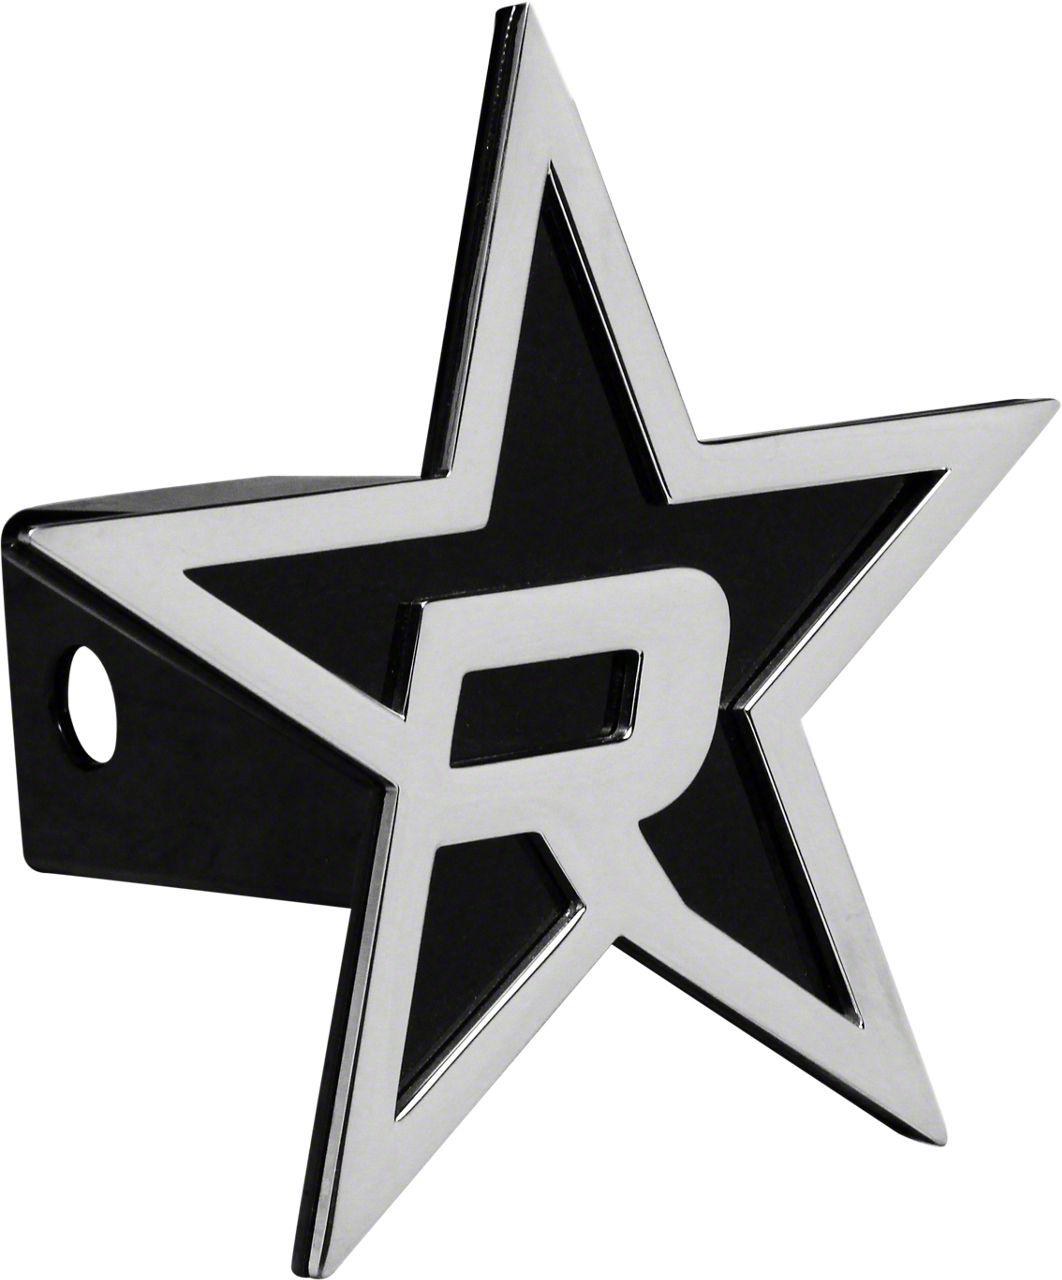 RBP Black/Chrome Star Hitch Cover (02-19 RAM 1500)